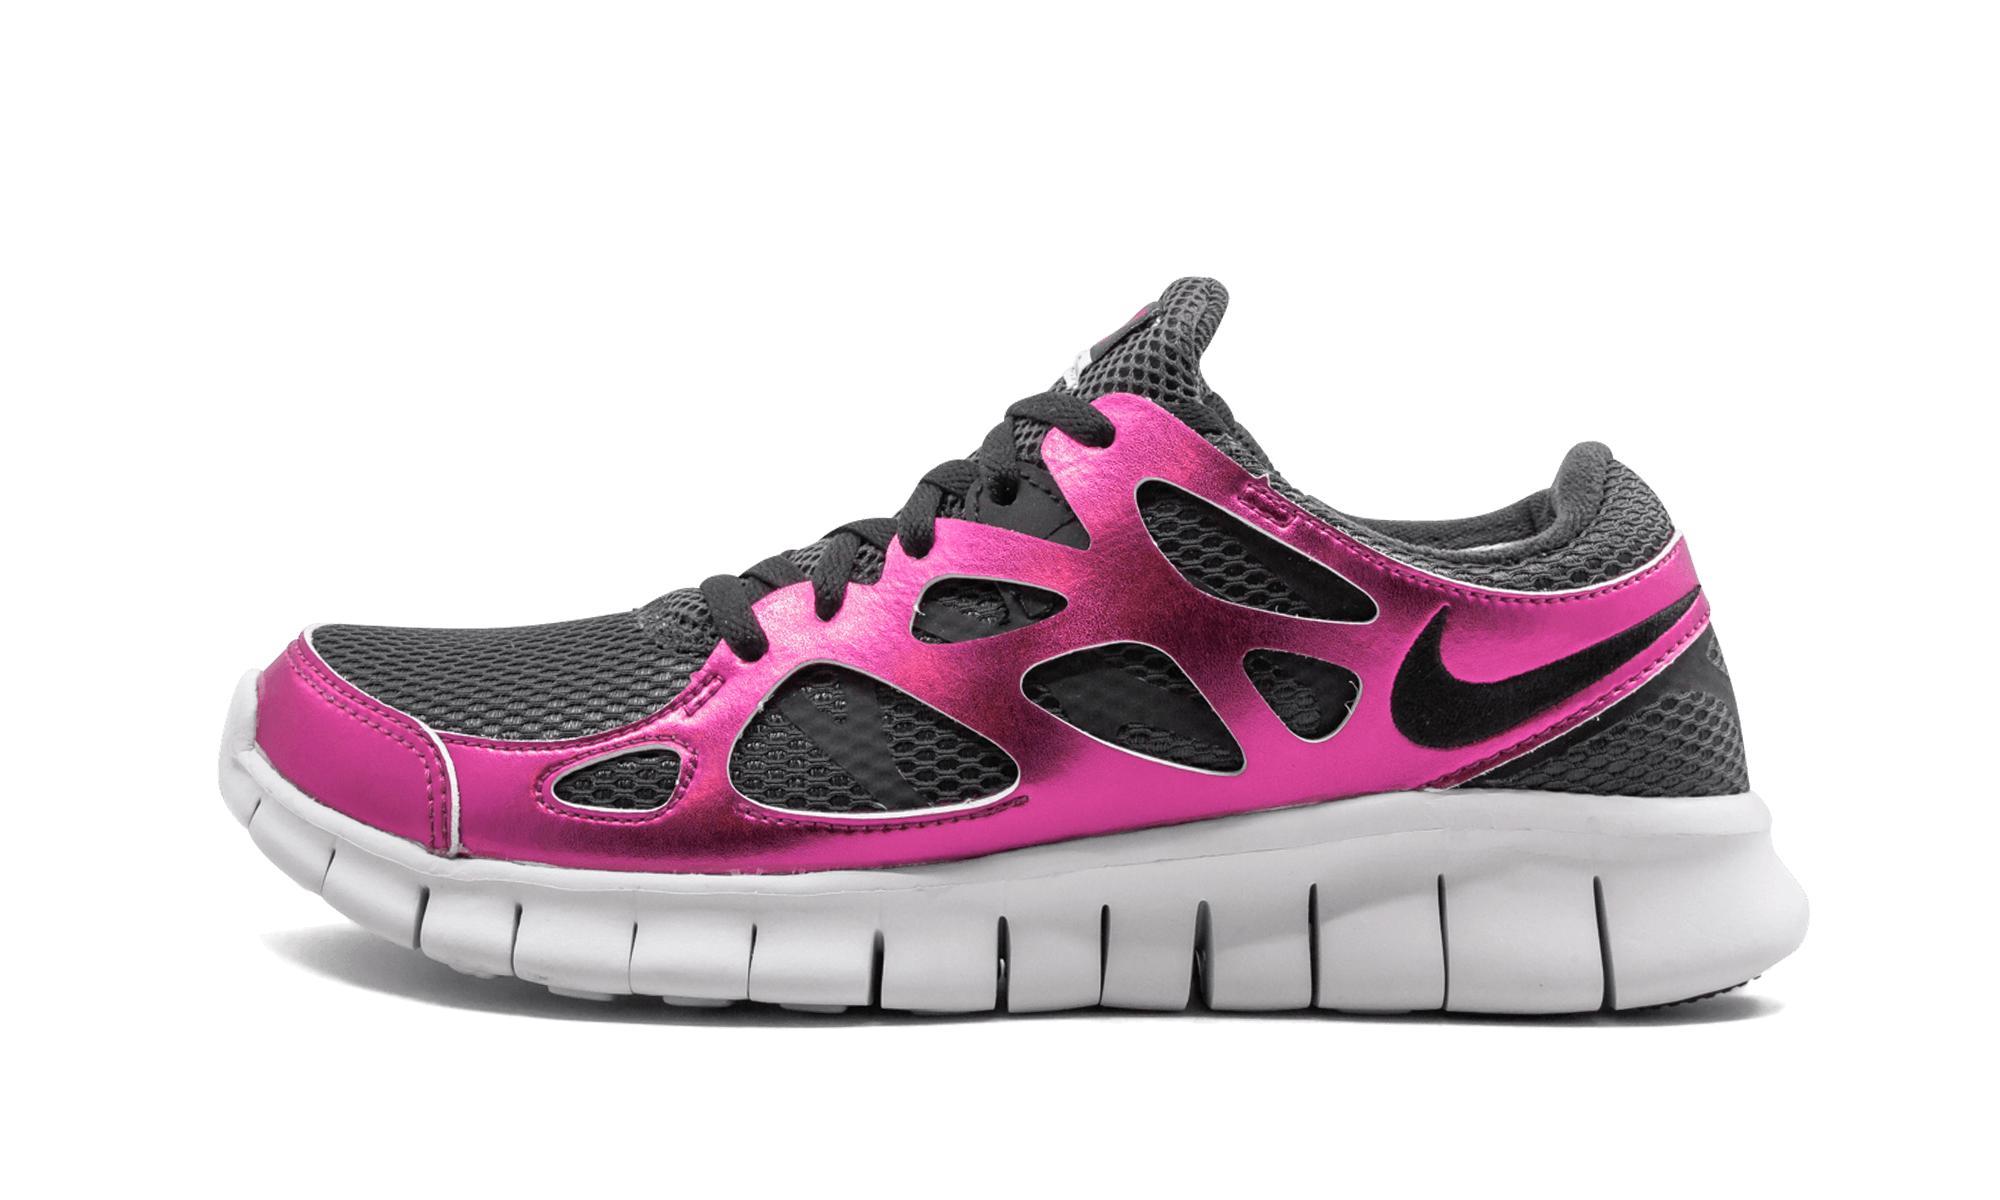 46caeaad6e41 Nike. Women s Wmns Free Run+ 2 Prm Ext